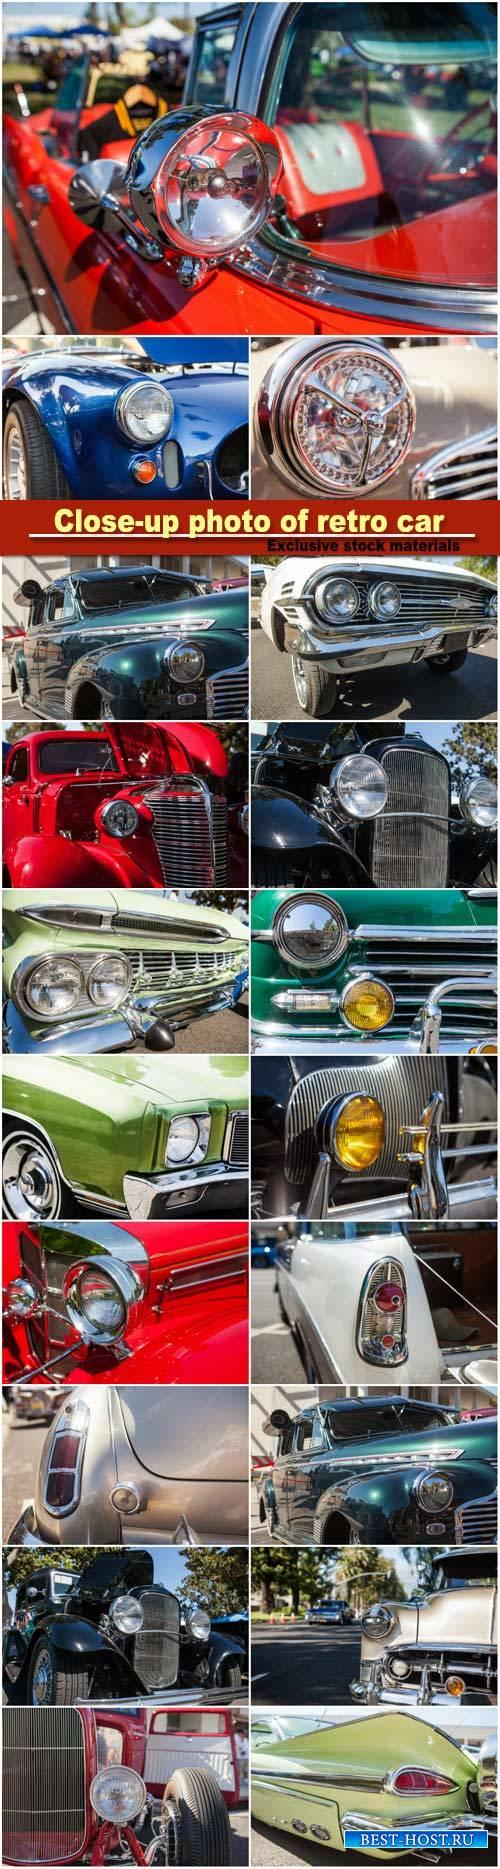 Close-up photo of retro car headlights, old vintage car